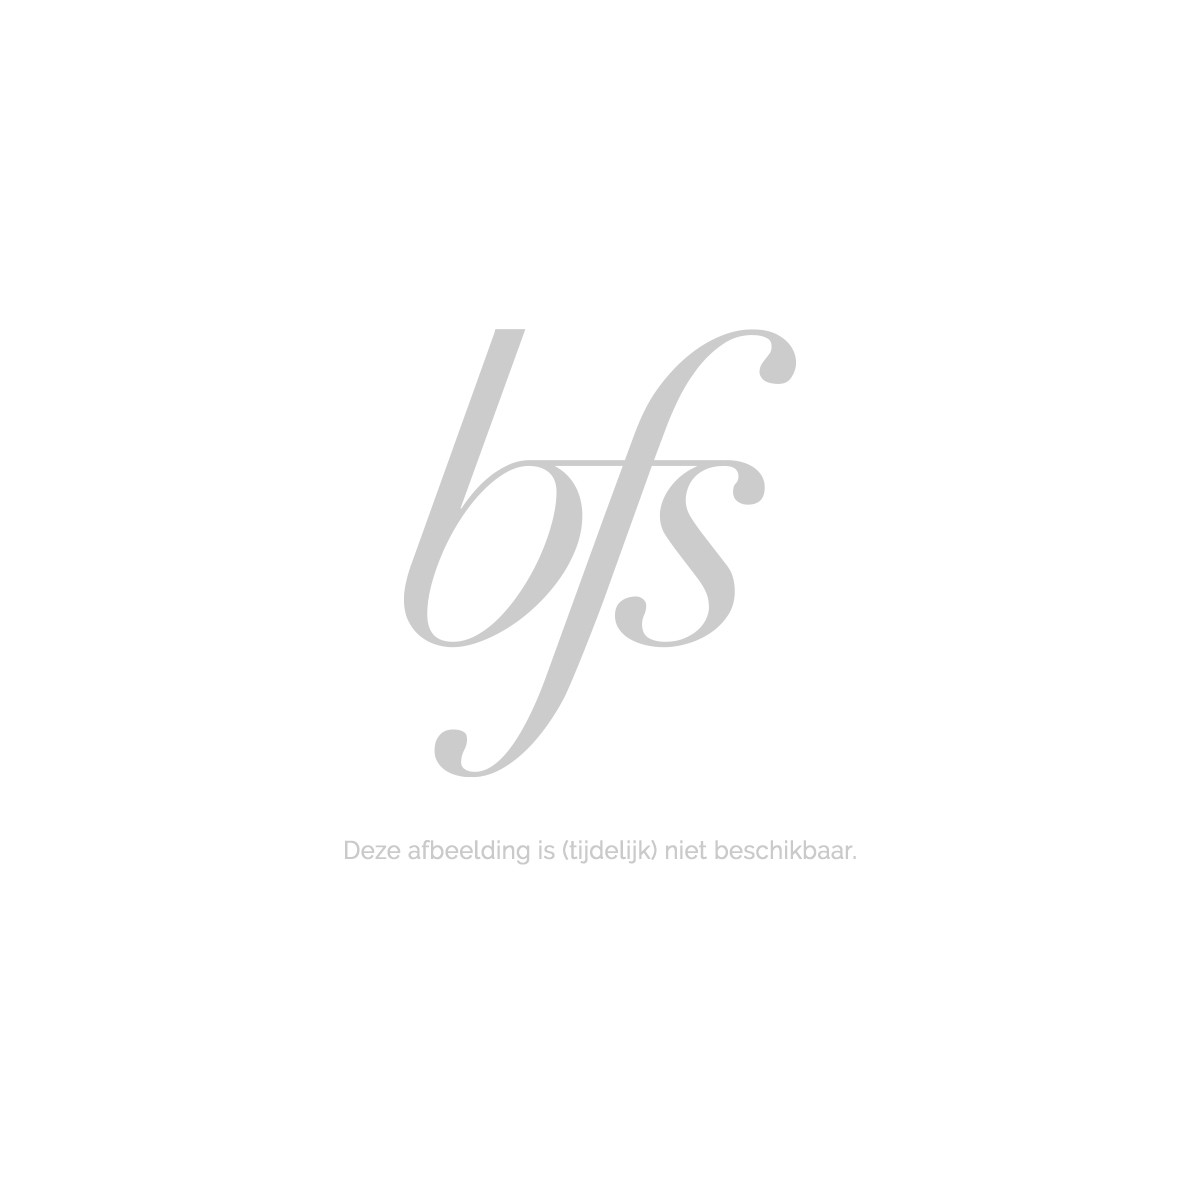 Michael Kors Sparkling Blush Eau De Parfum Spray 50 Ml